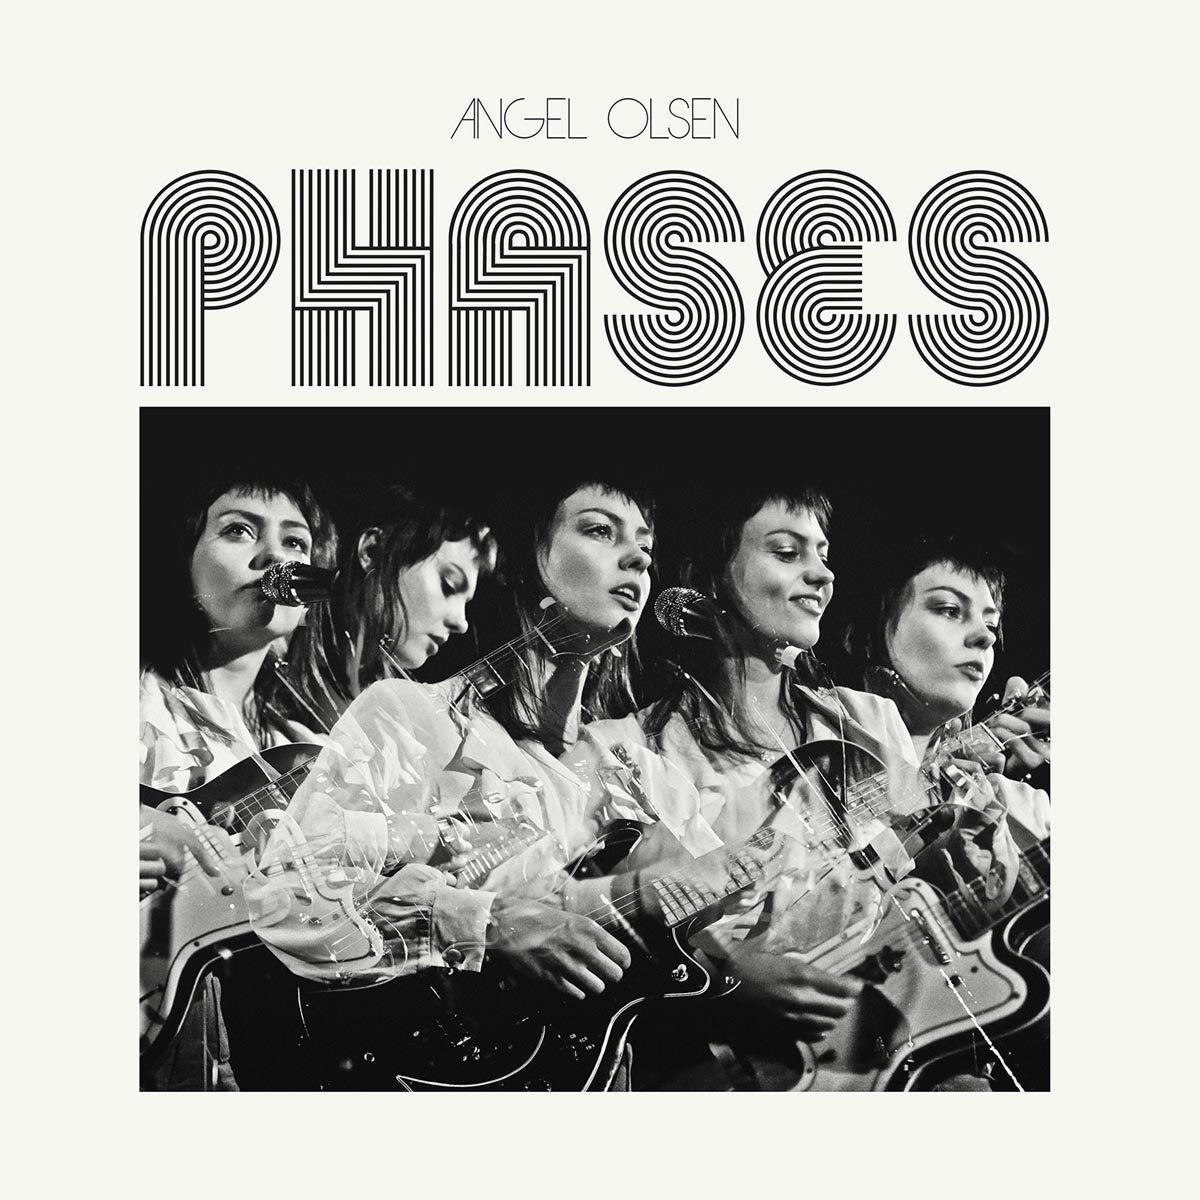 Phases (LP) by Angel Olsen image